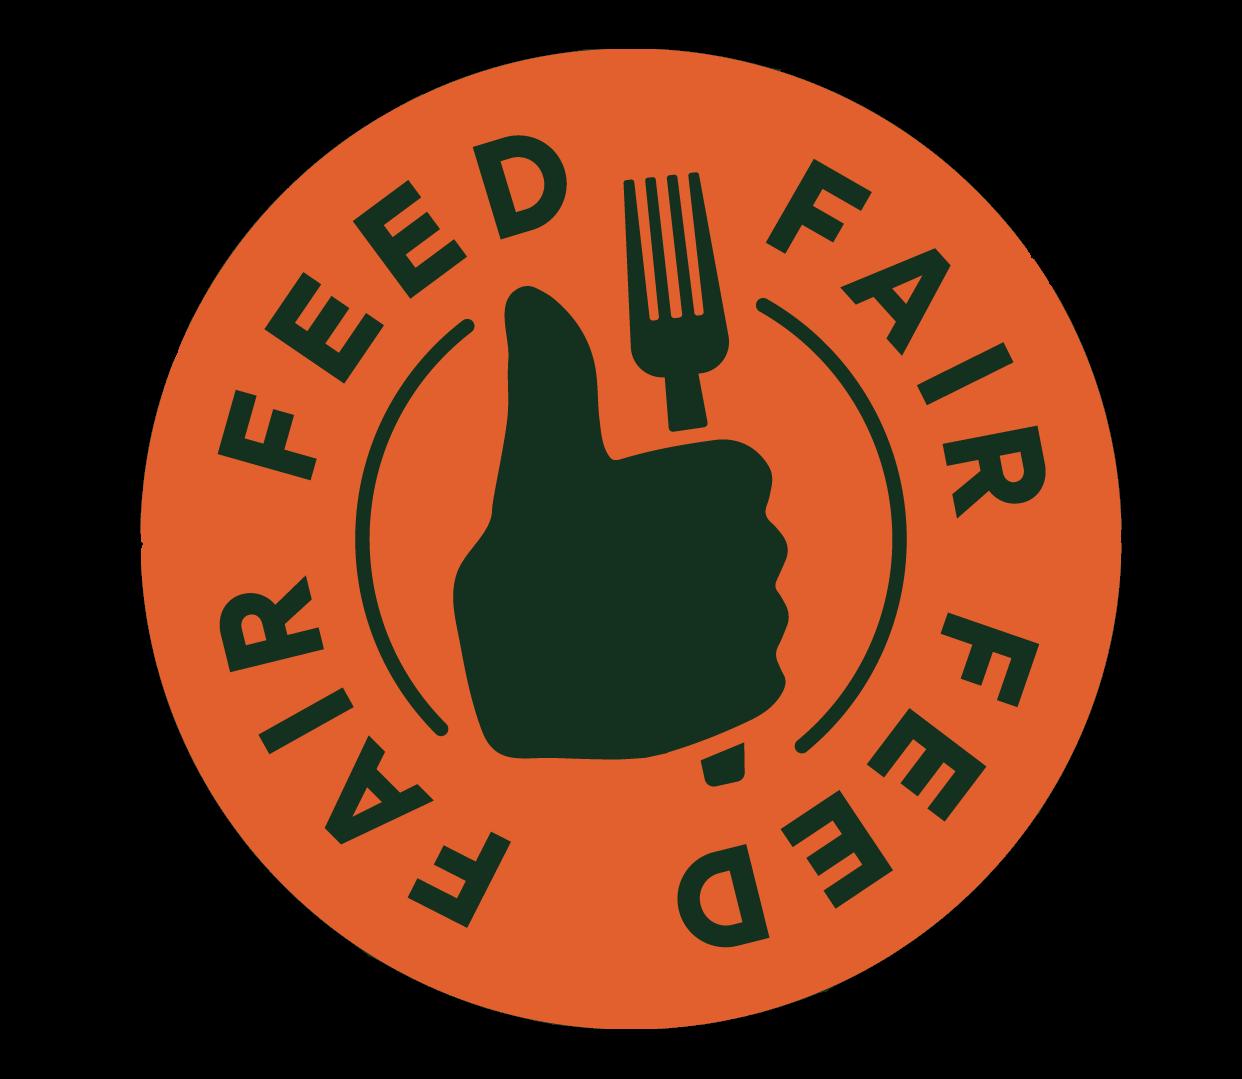 FairFeed